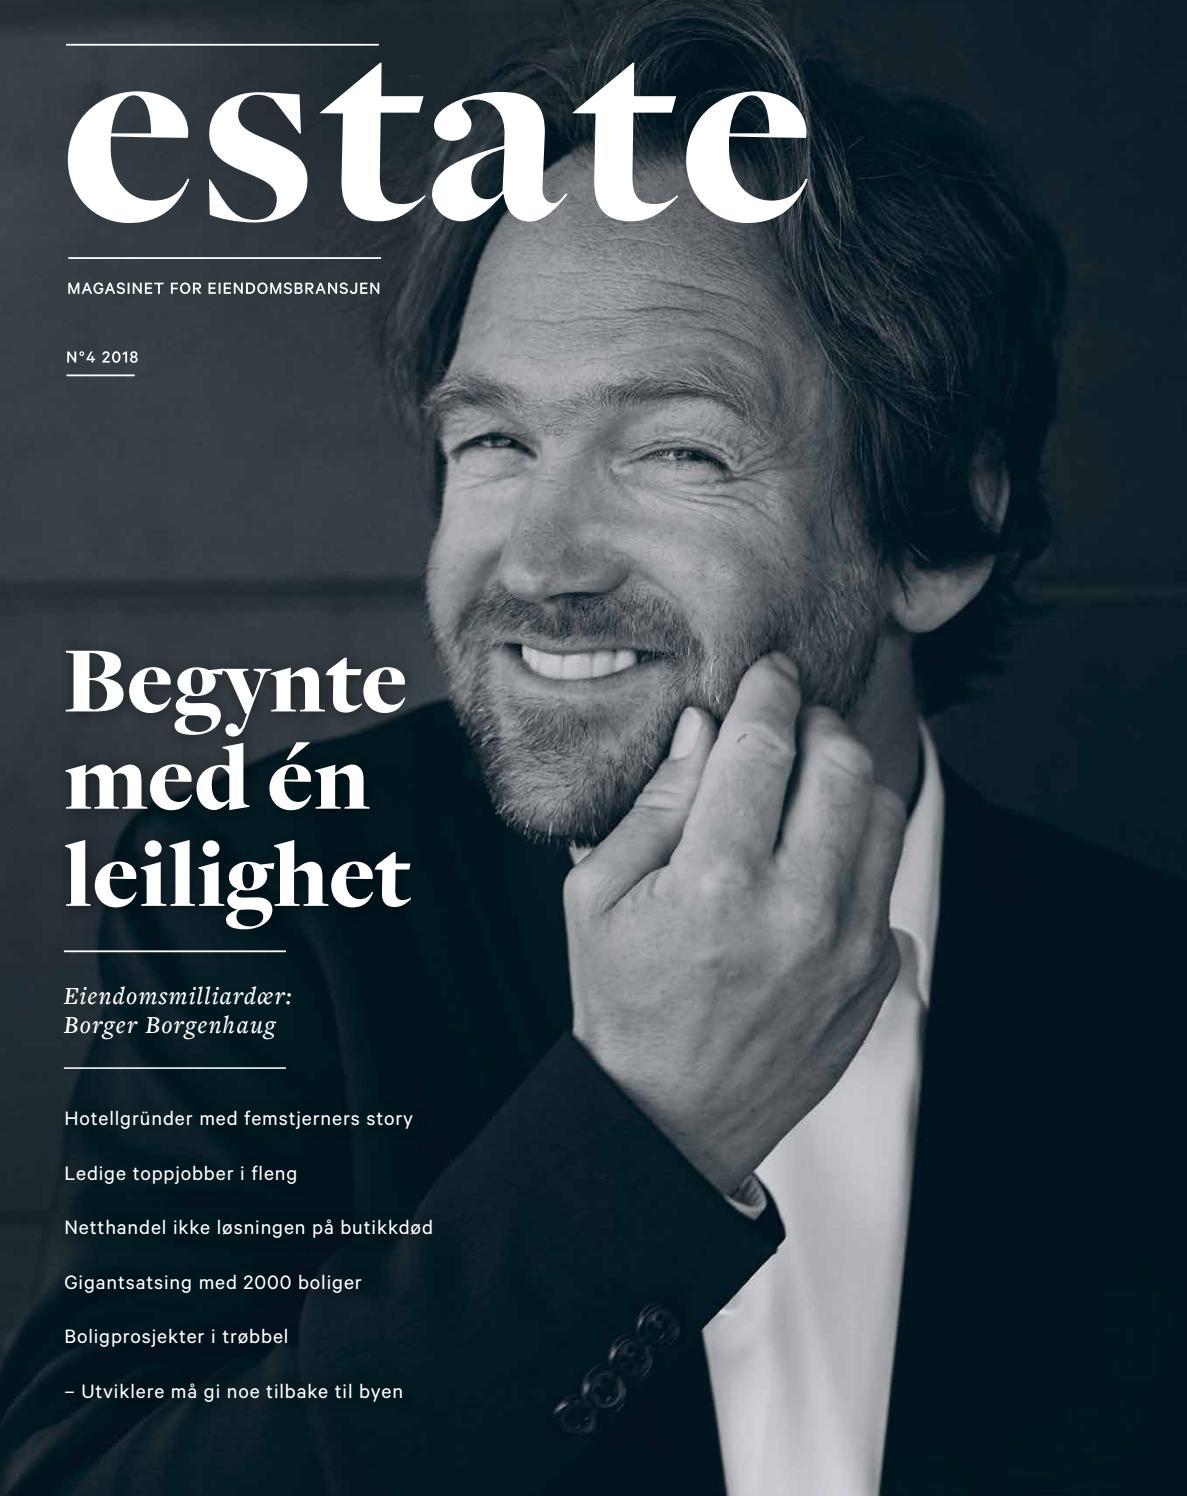 fe3d39f81 Estate Magasin 04 2018 by Estate Media - issuu